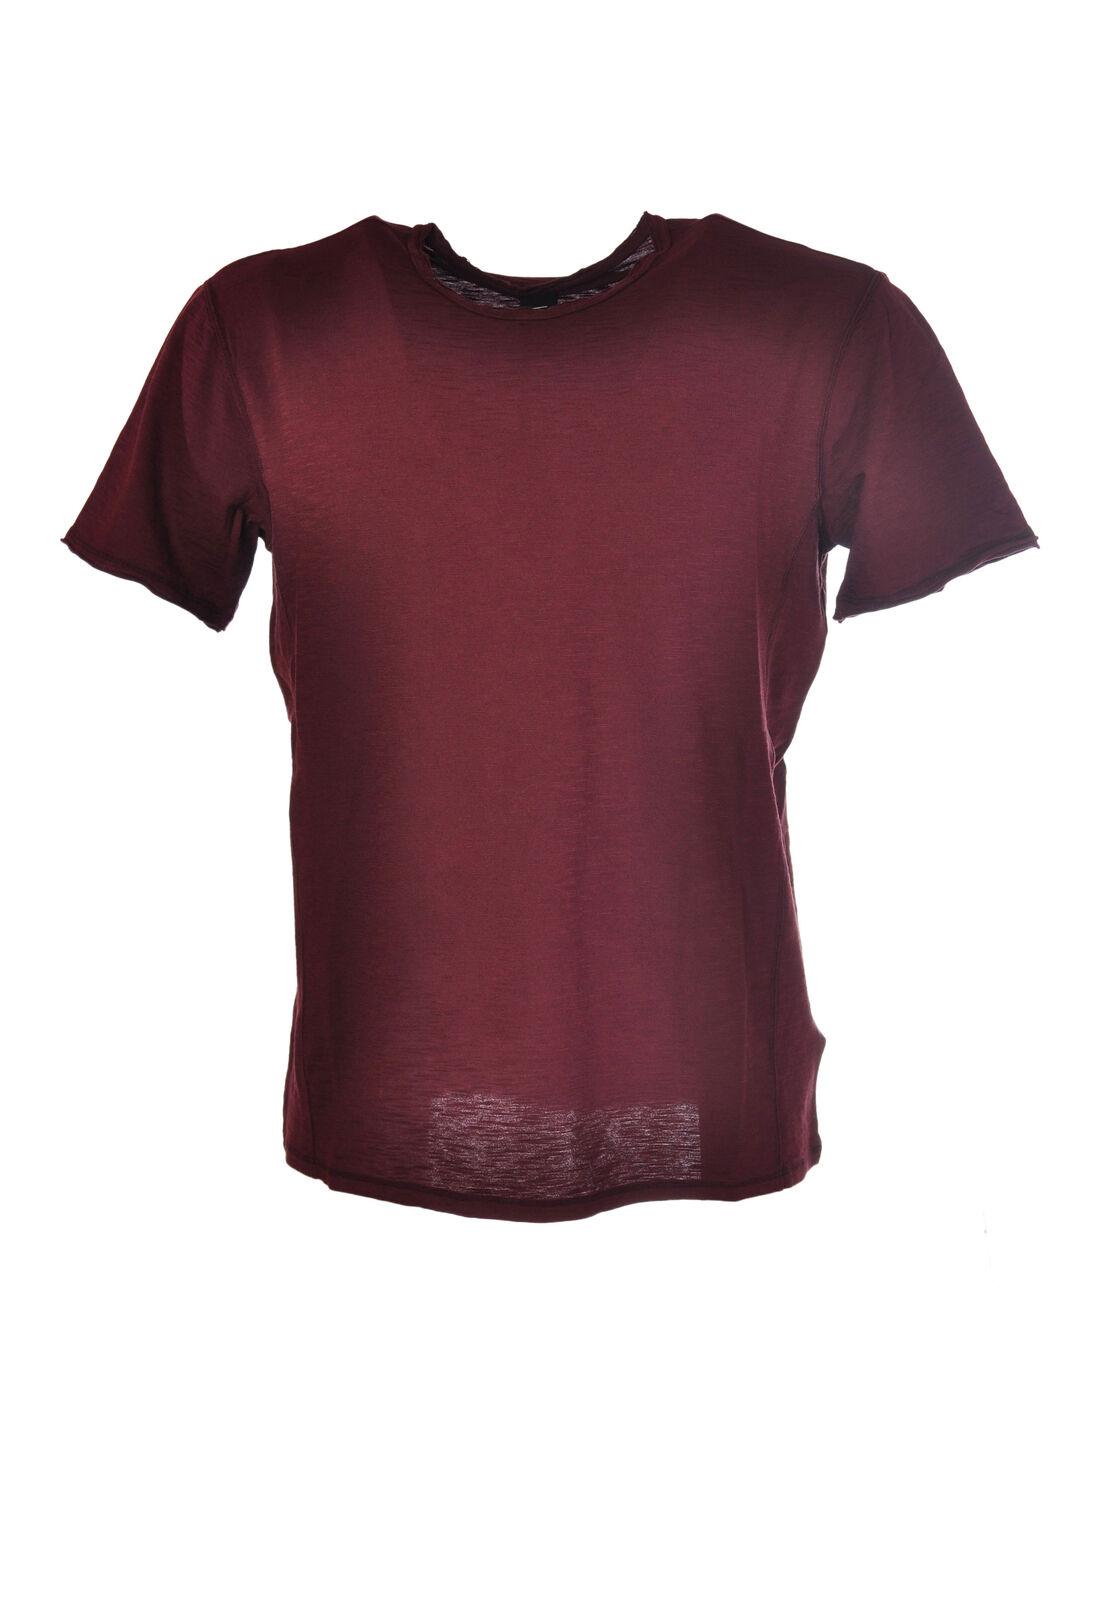 Hosio - Topwear-T-shirts -  Herren - Marrone - 2781803N184522